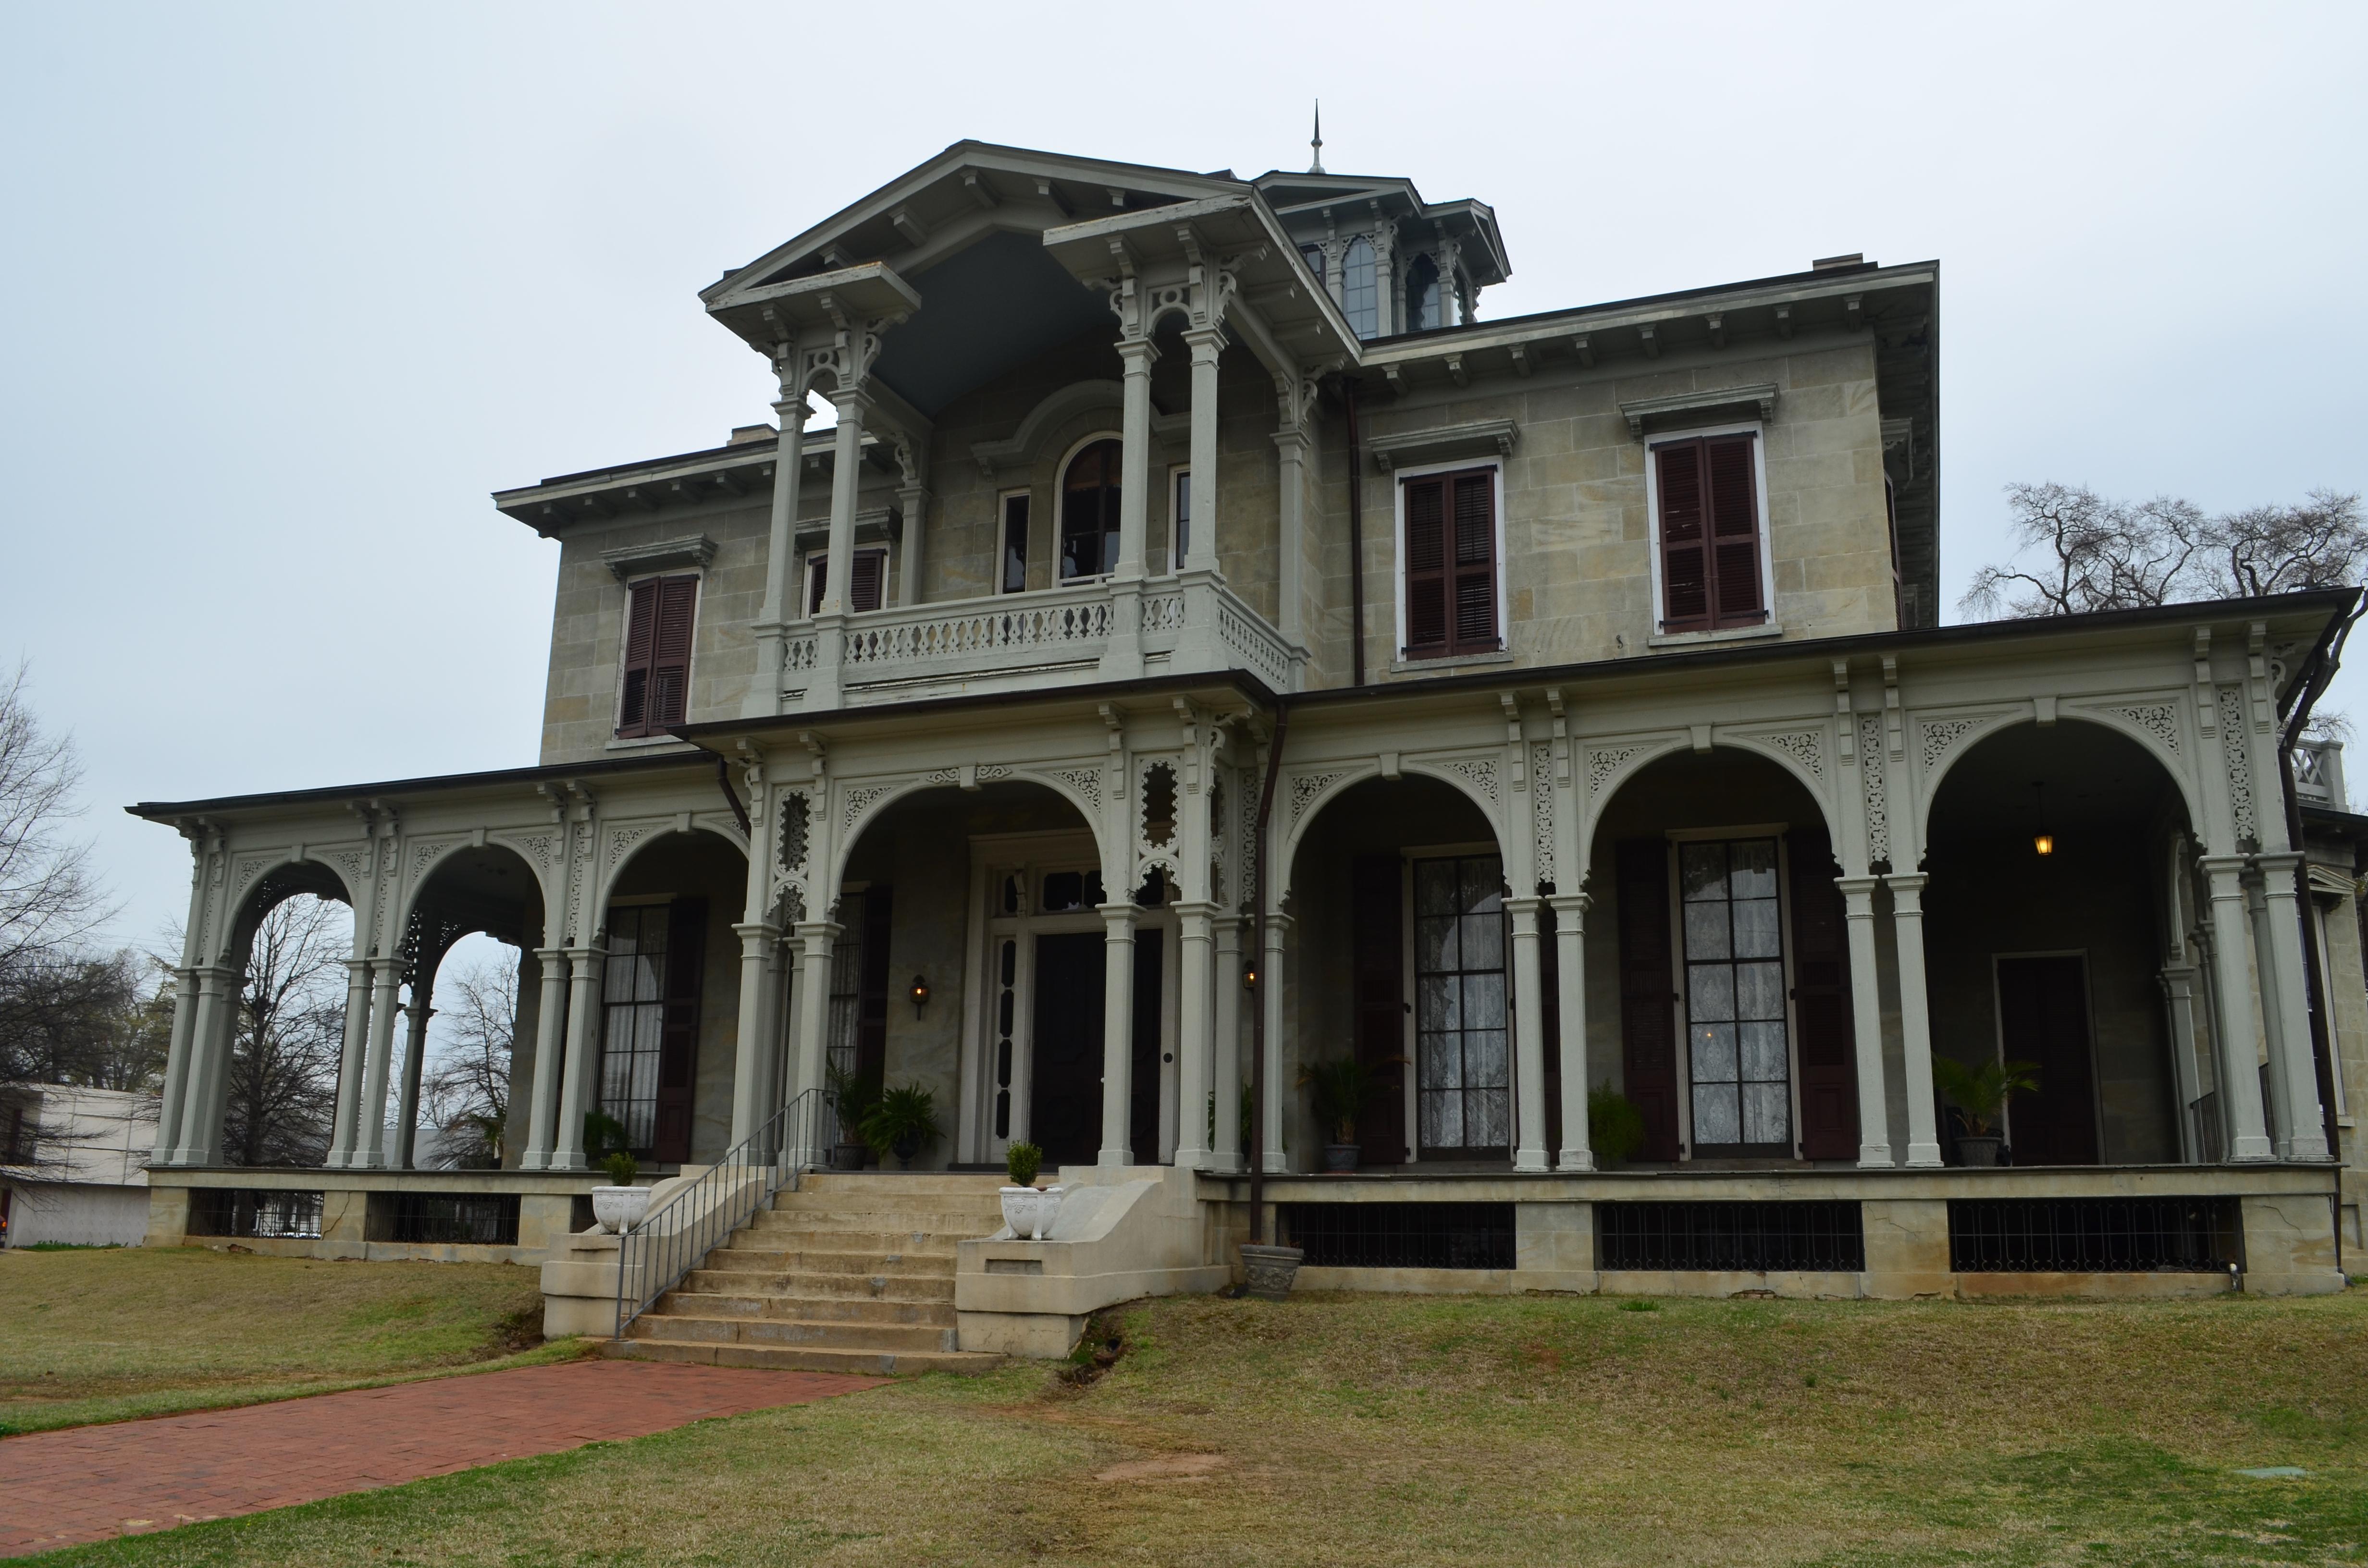 Jemison van de graaff mansion alabama architecture for Mansion architecture